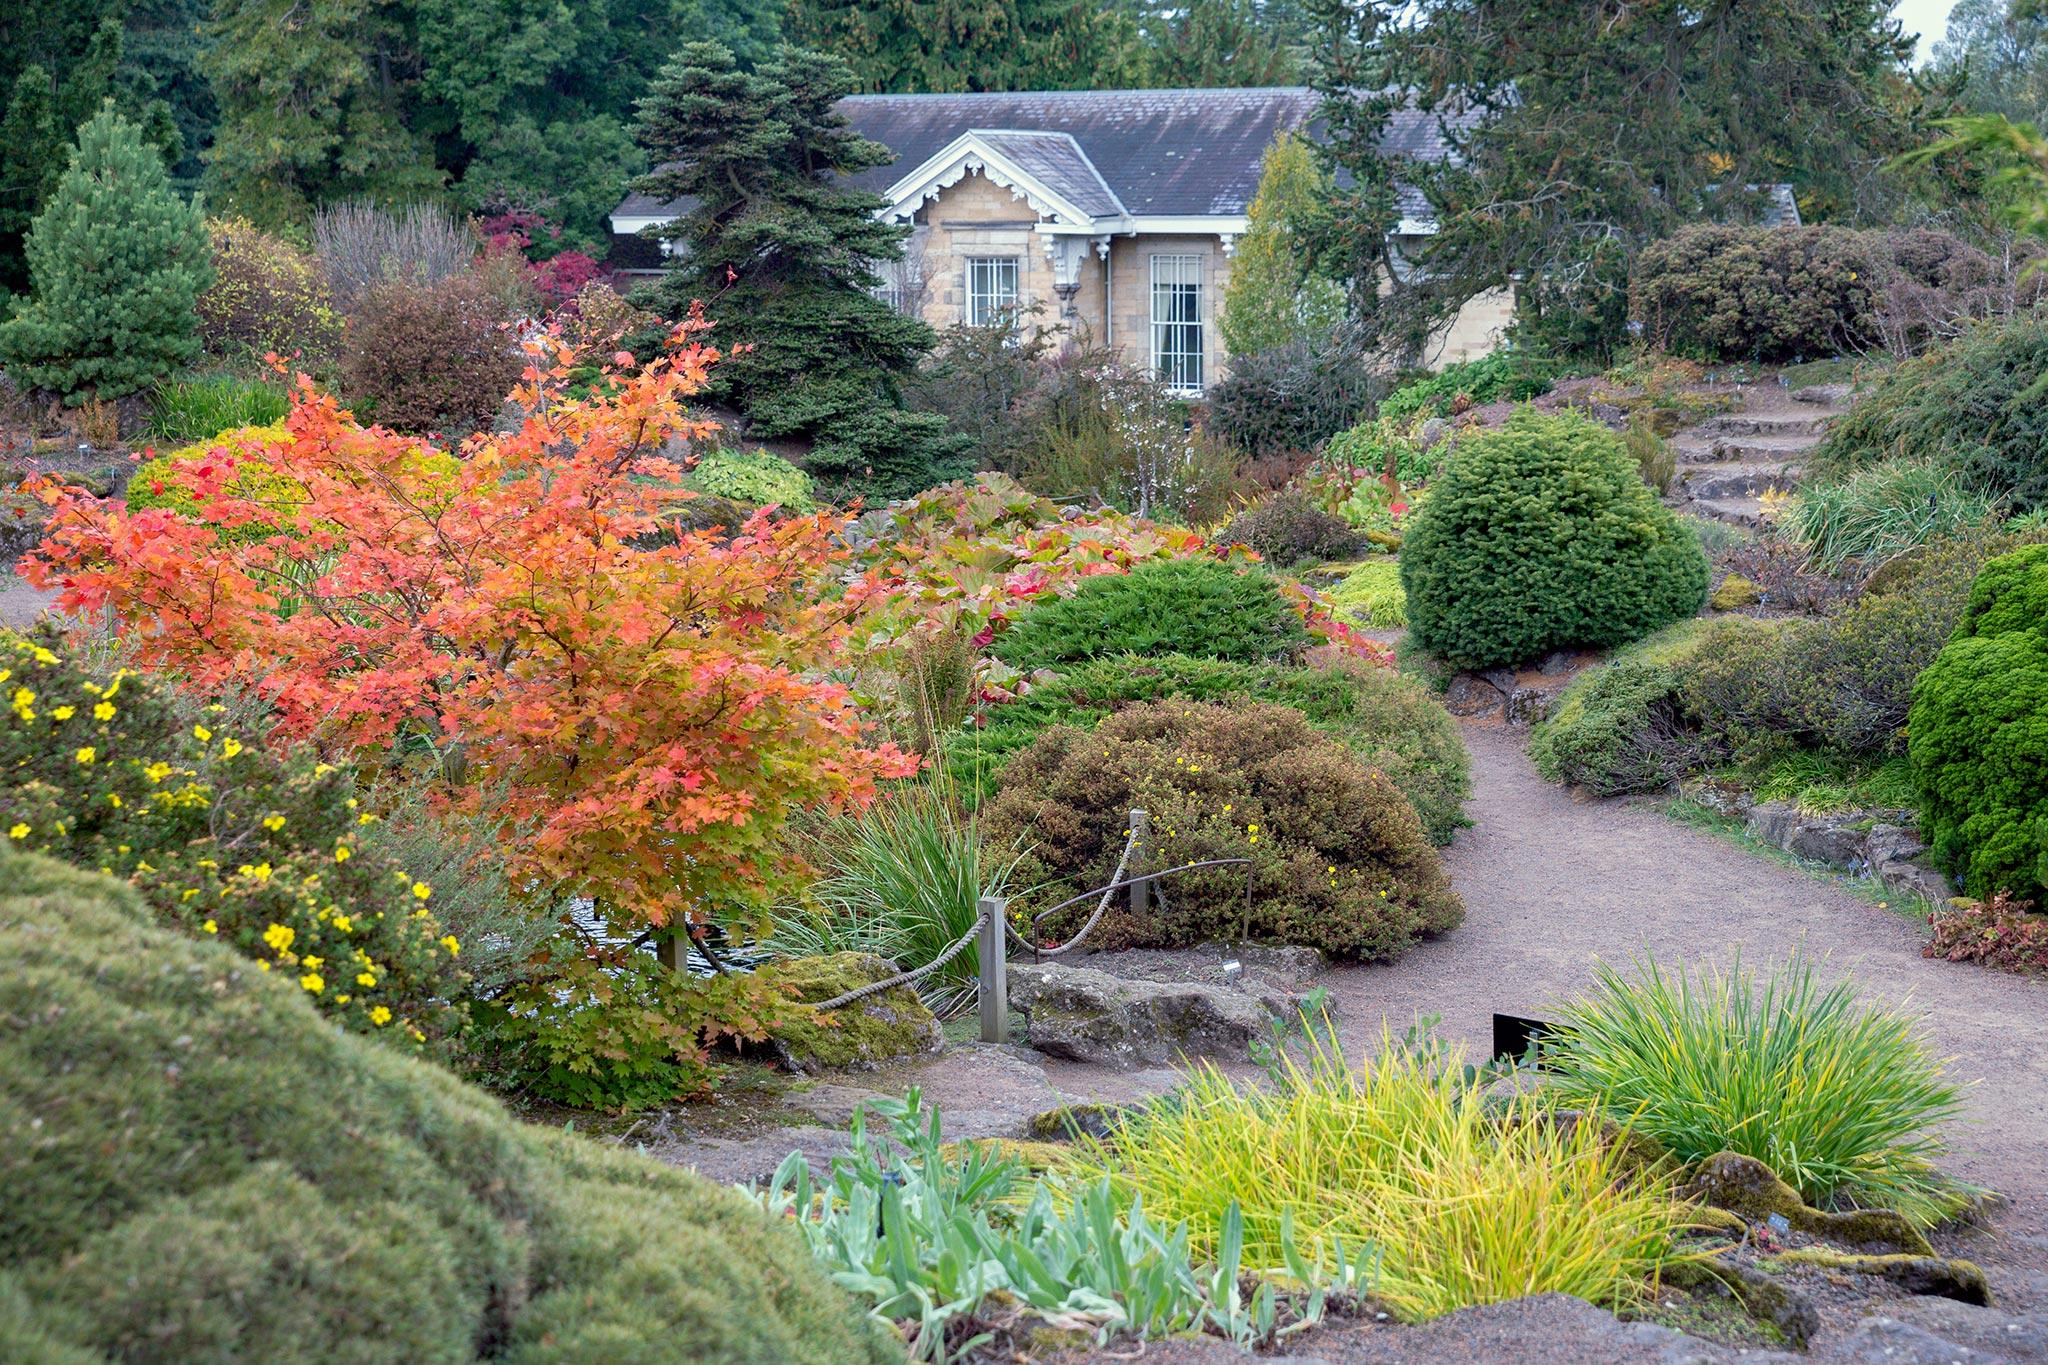 Edinburghin botaaninen © Tuulia Kolehmainen